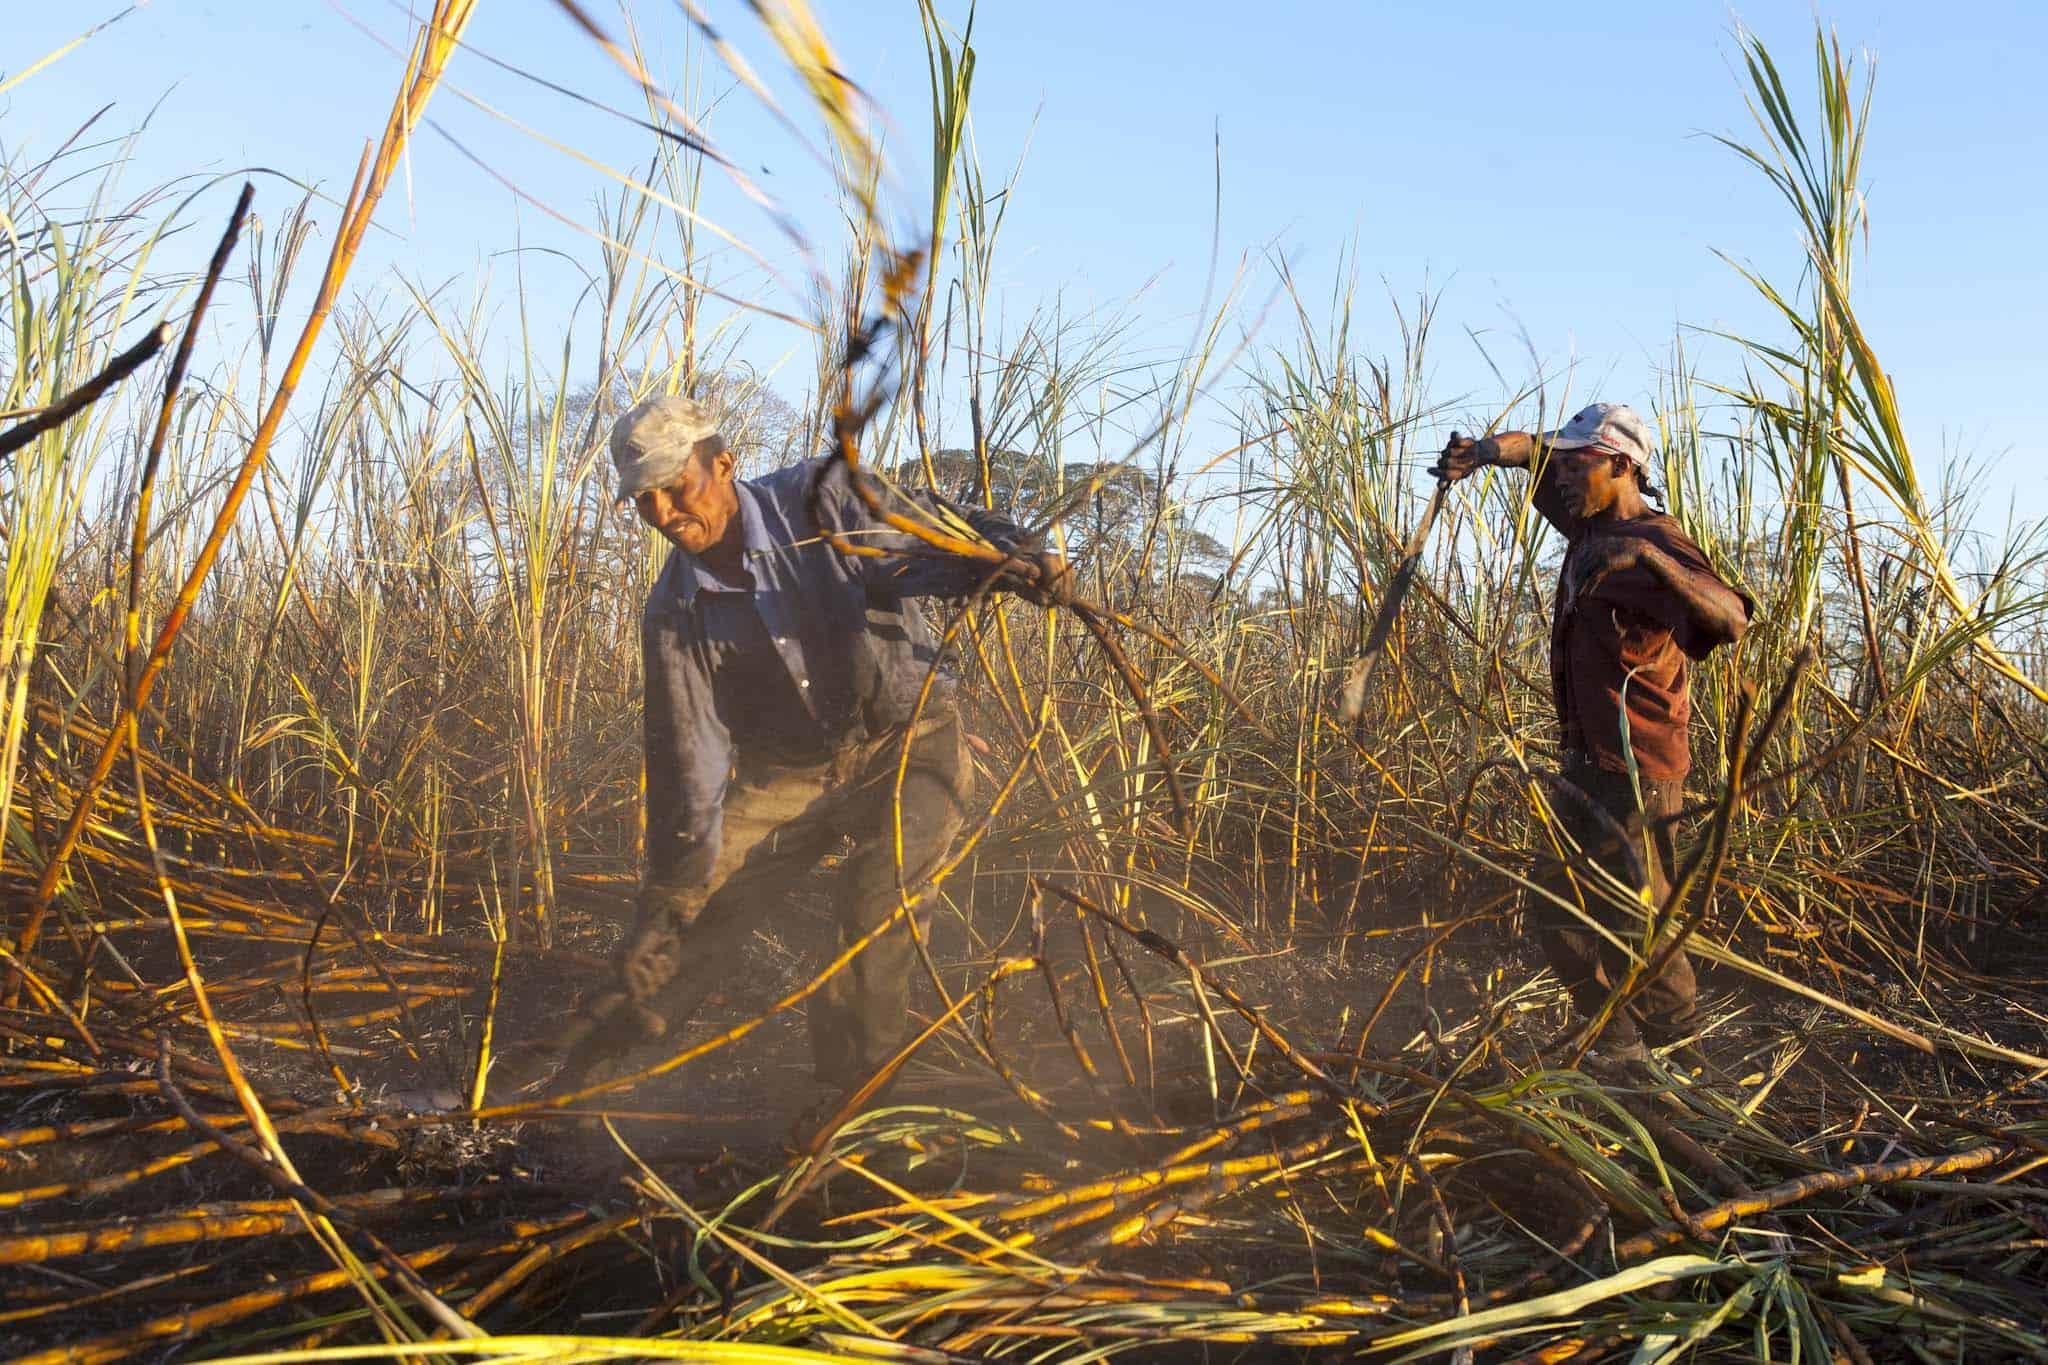 harvesting sugarcane